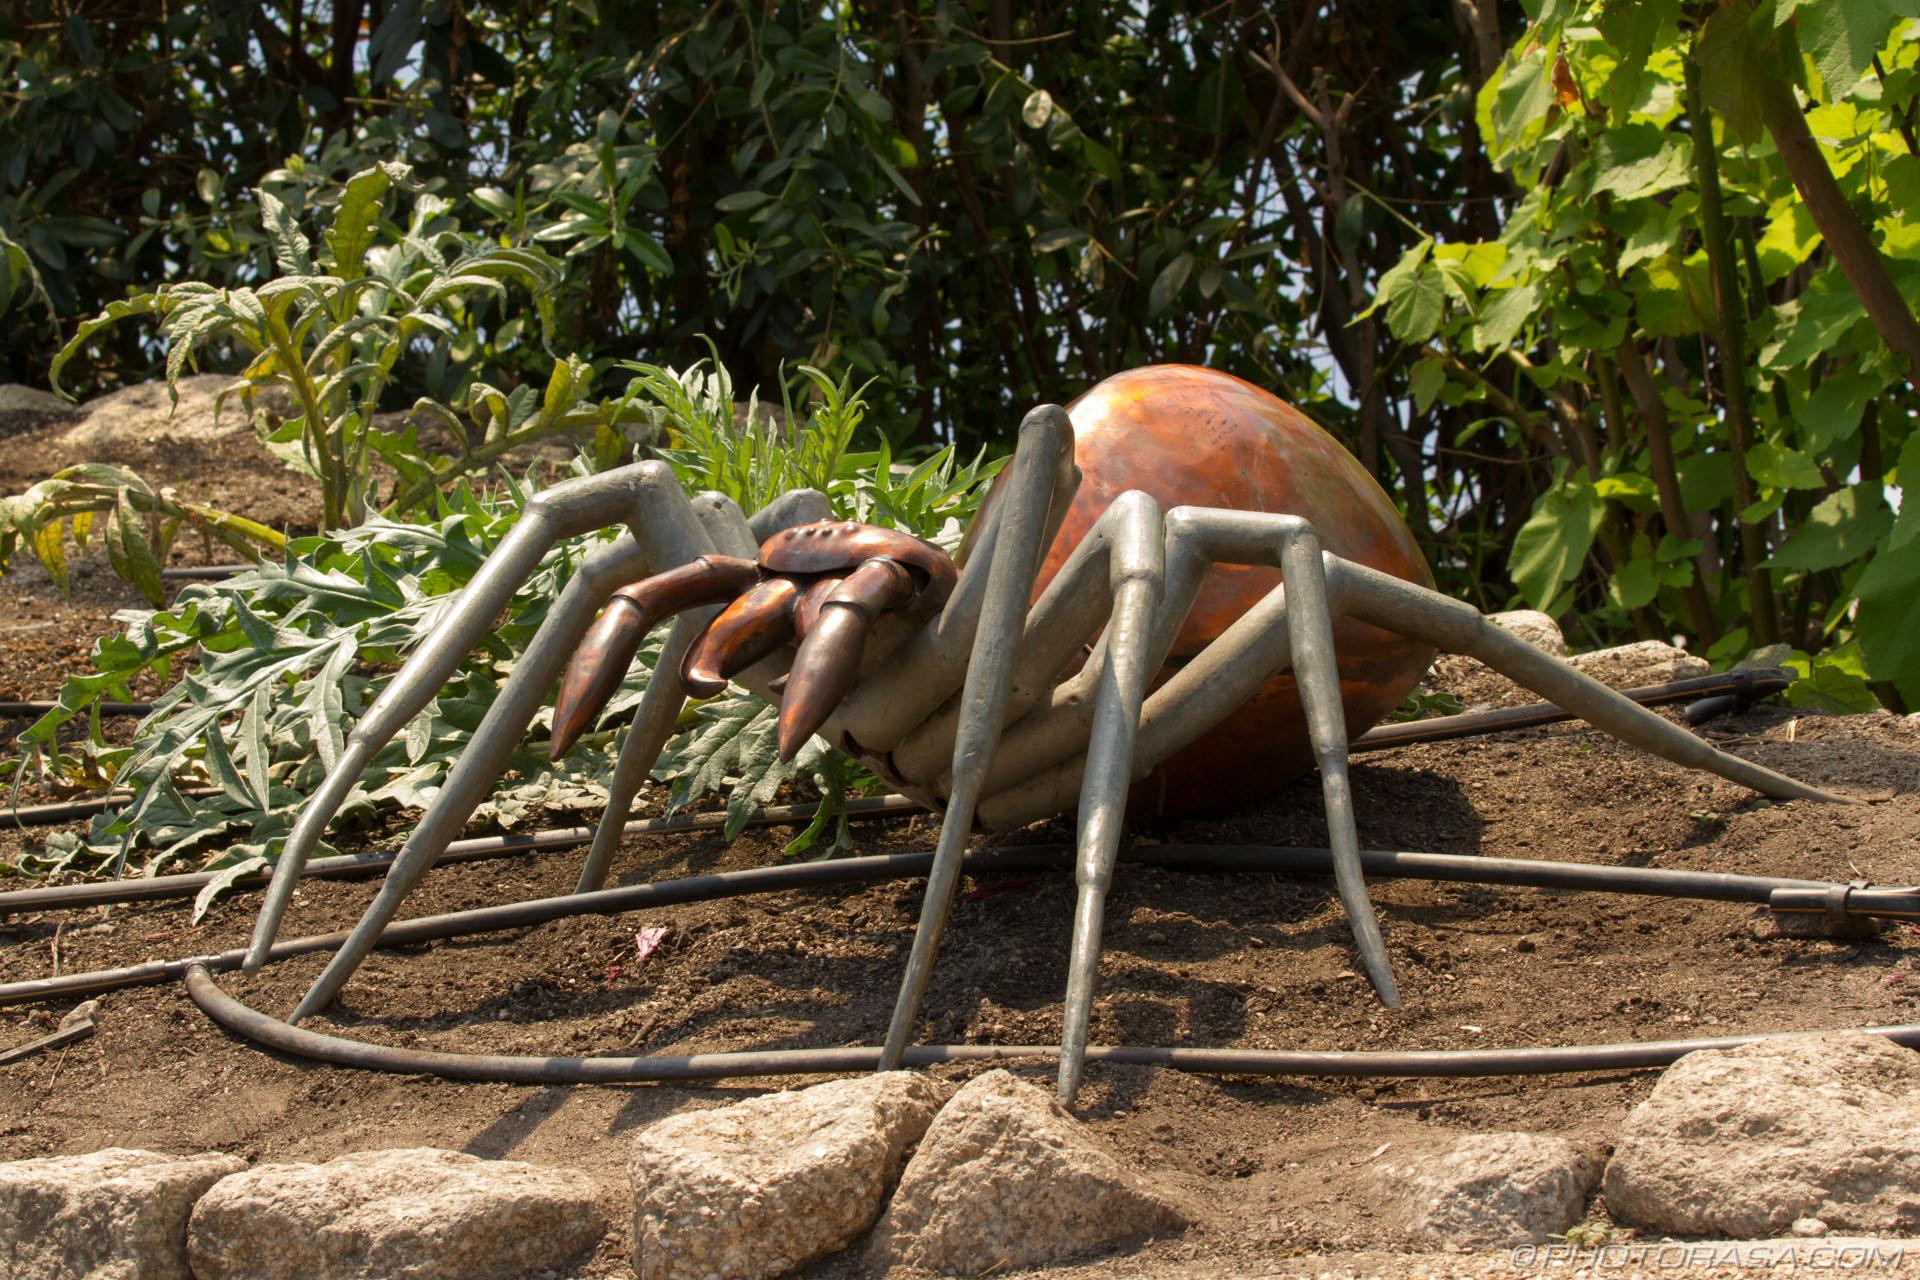 http://photorasa.com/garden-sculptures/metal-spider-sculpture/